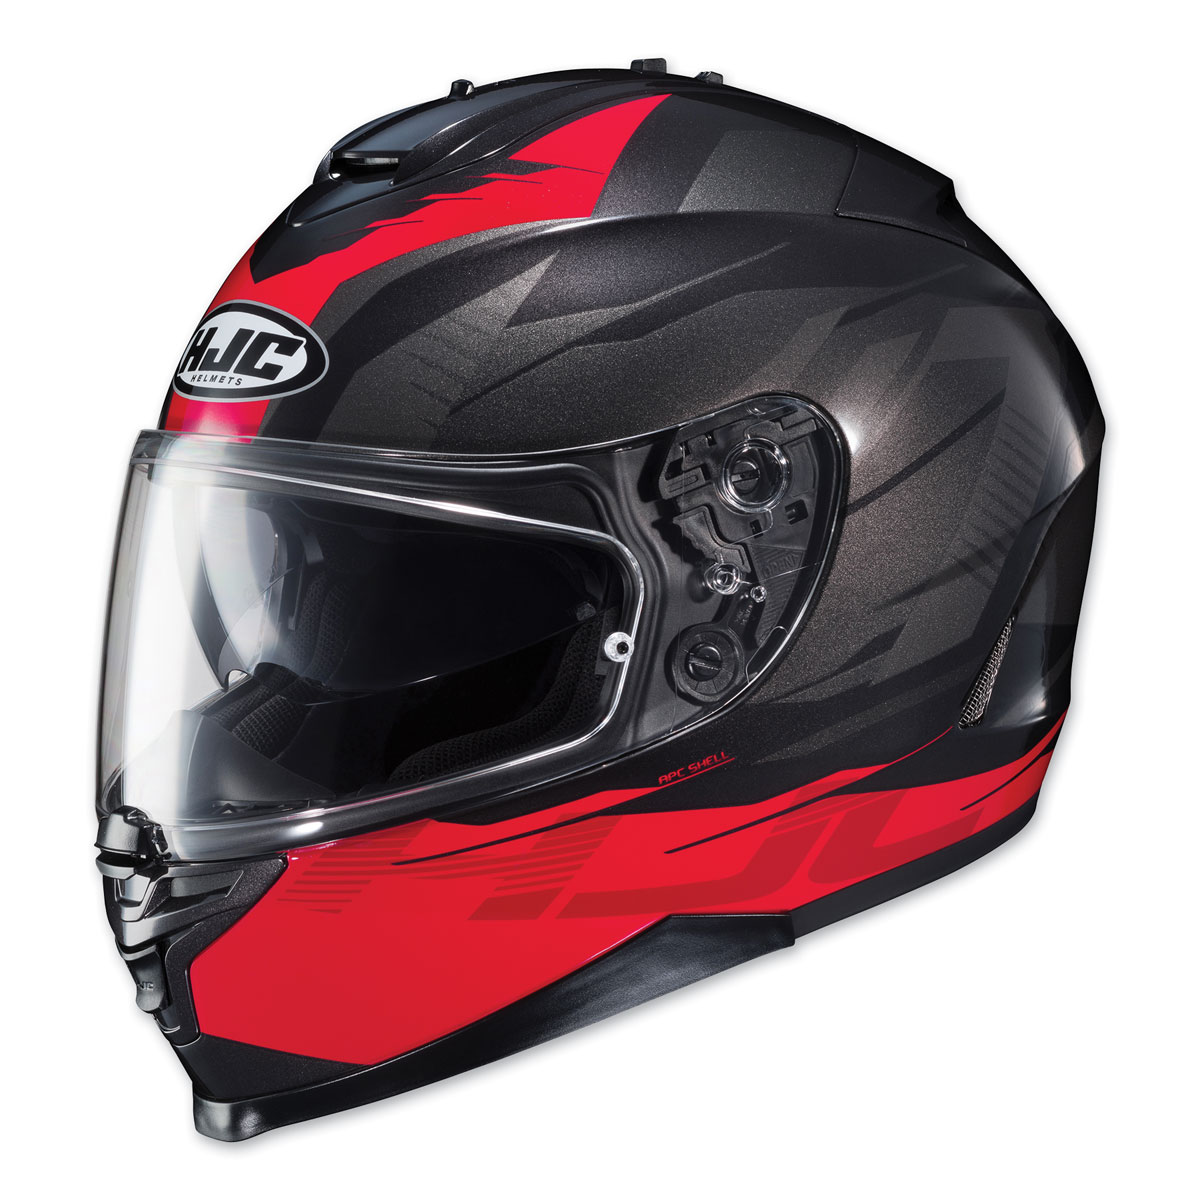 HJC IS-17 Tario Red/Charcoal Full Face Helmet